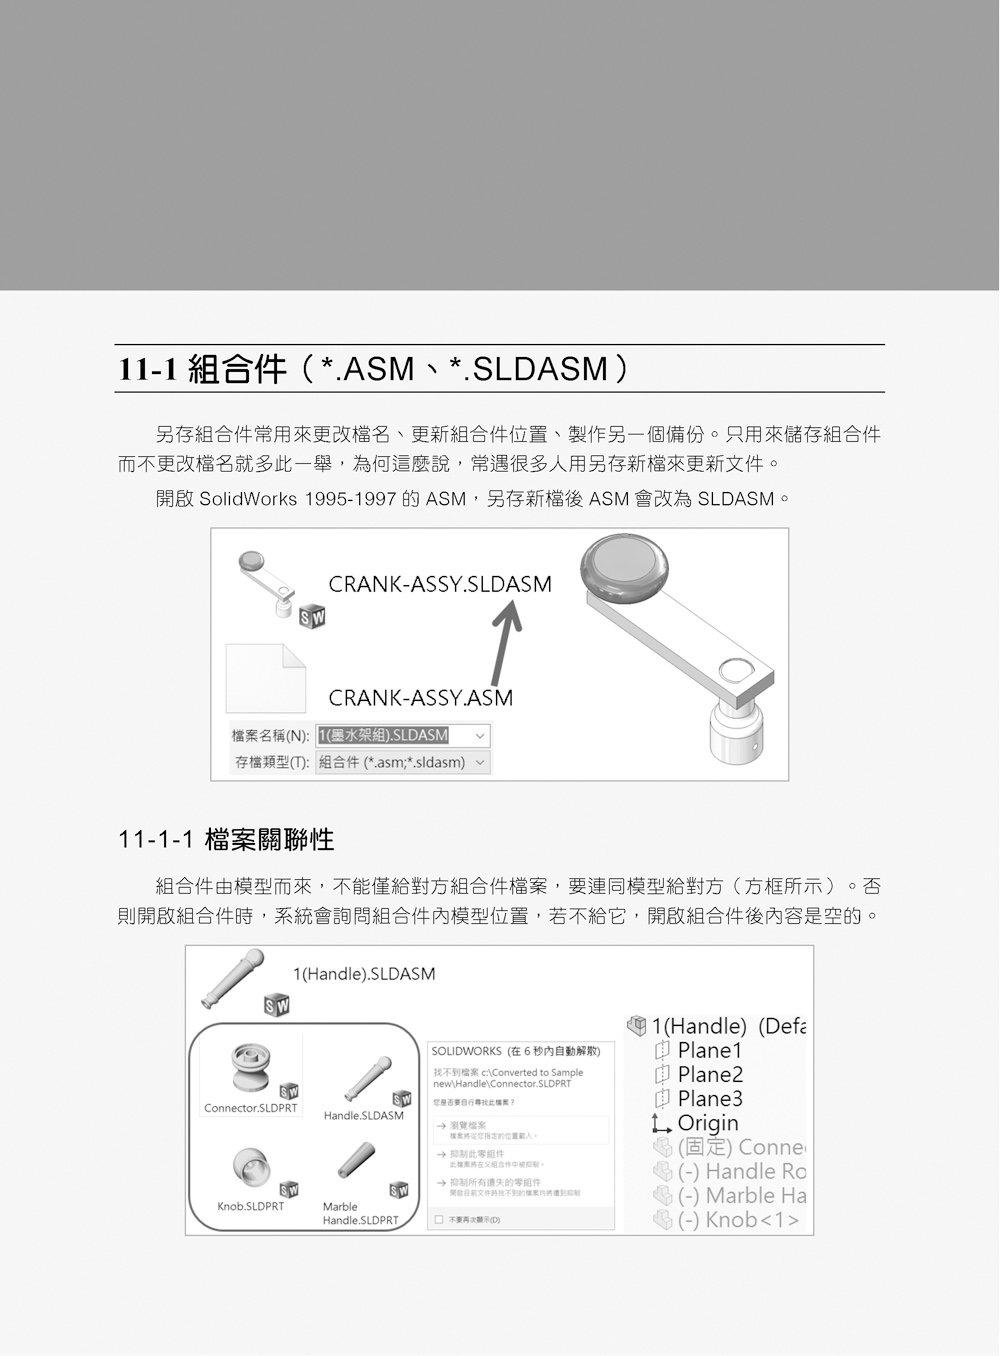 Solidworks 專業工程師訓練手冊[9]-模型轉檔與修復策略-preview-9